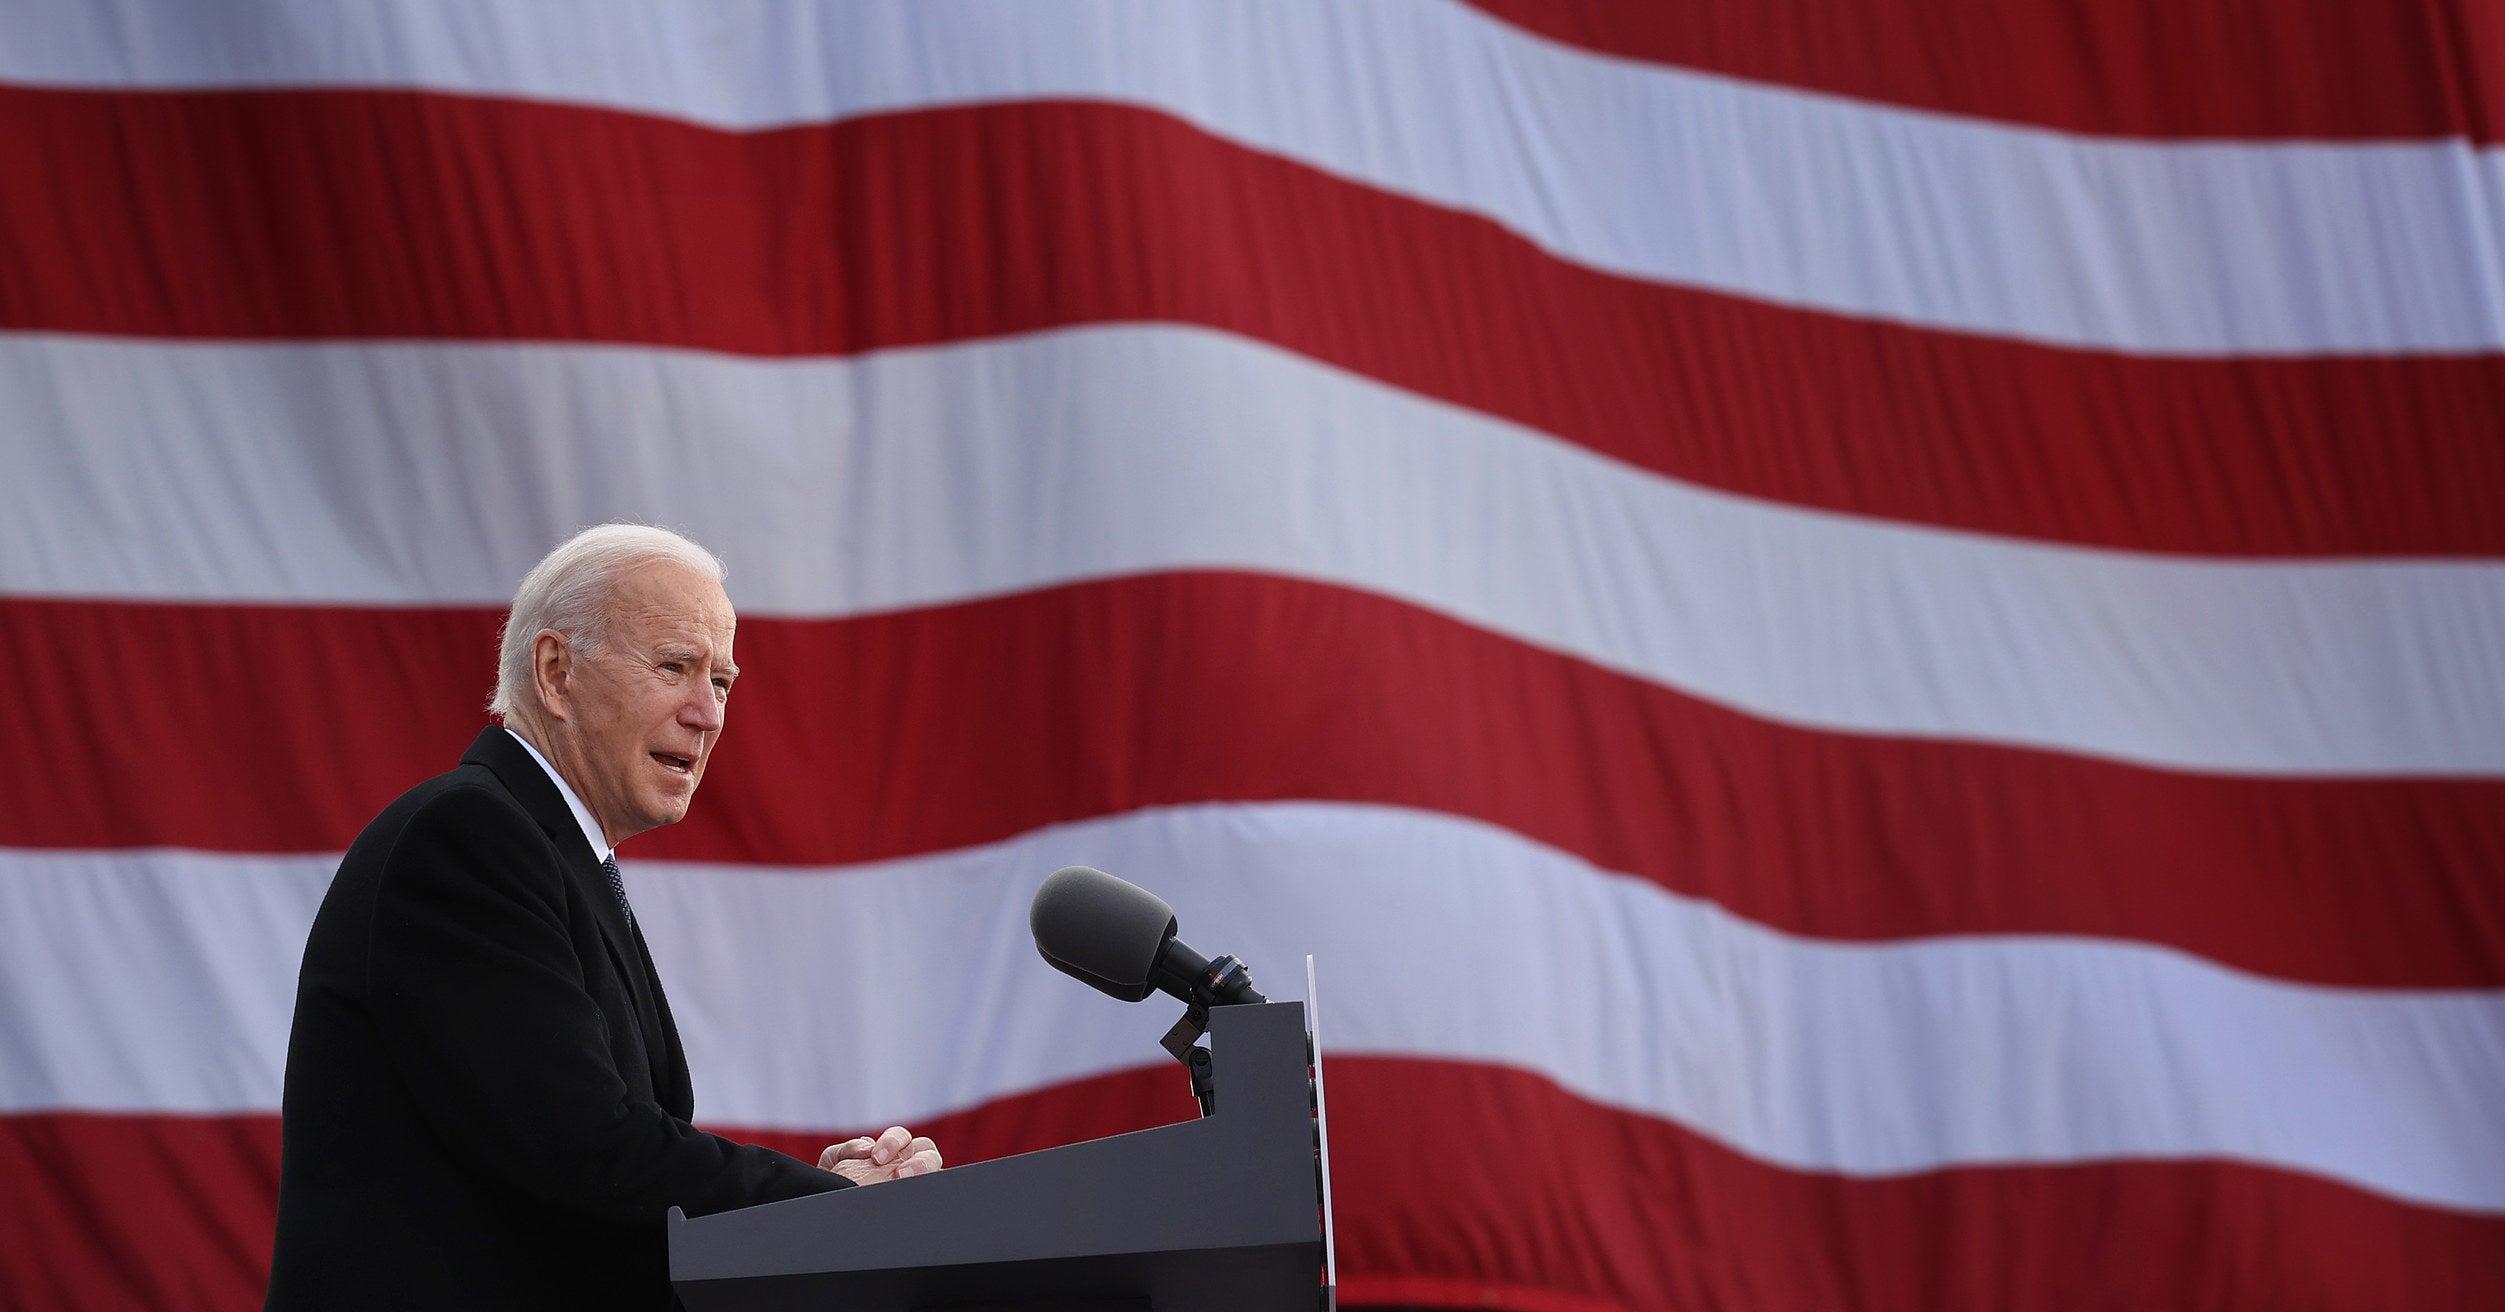 Now Joe Biden Gets To Sort Out America's Soul